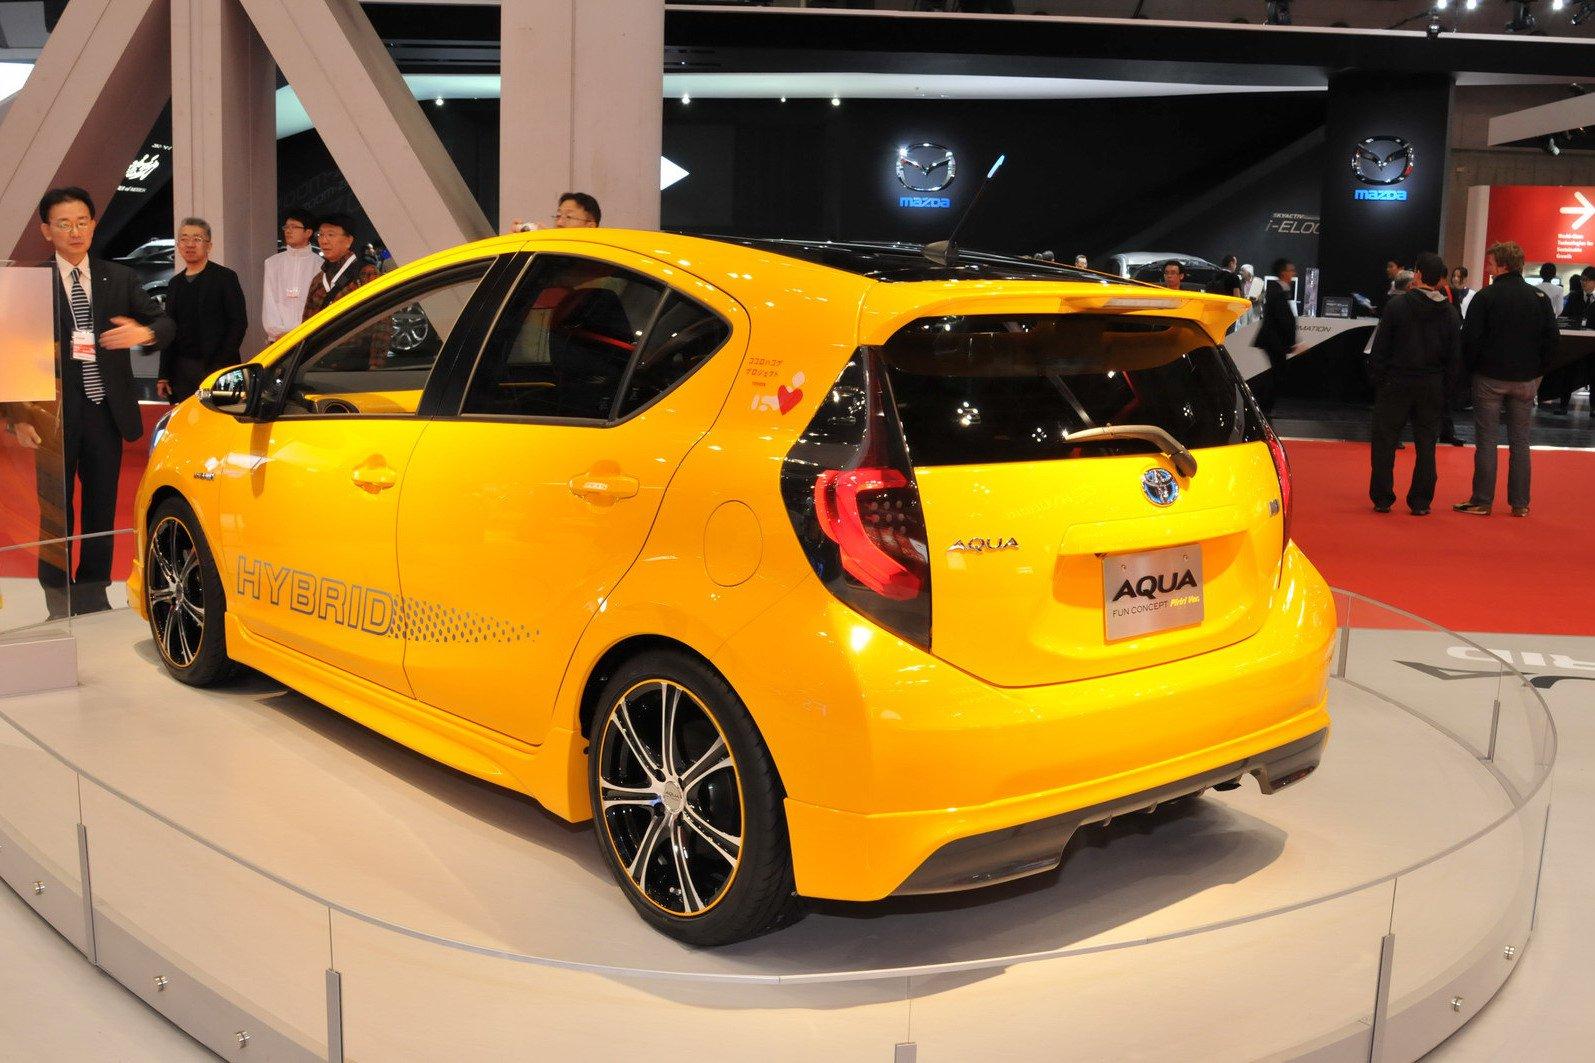 Toyota-KAW-Aqua-Fun-Concept-Carscoop2.jpg